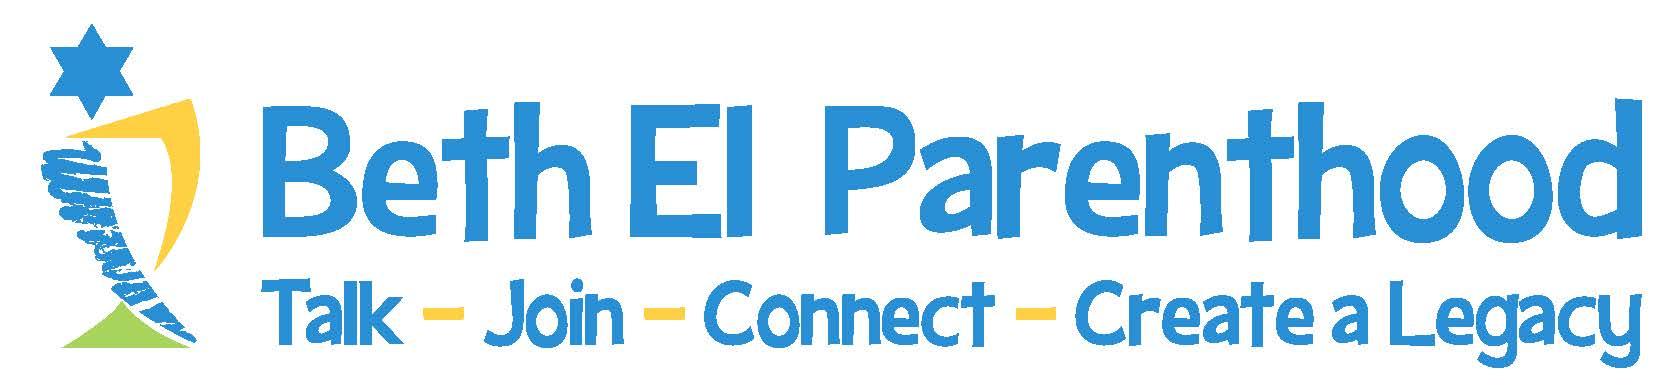 Beth El Parenthood Early Learning Center Logo